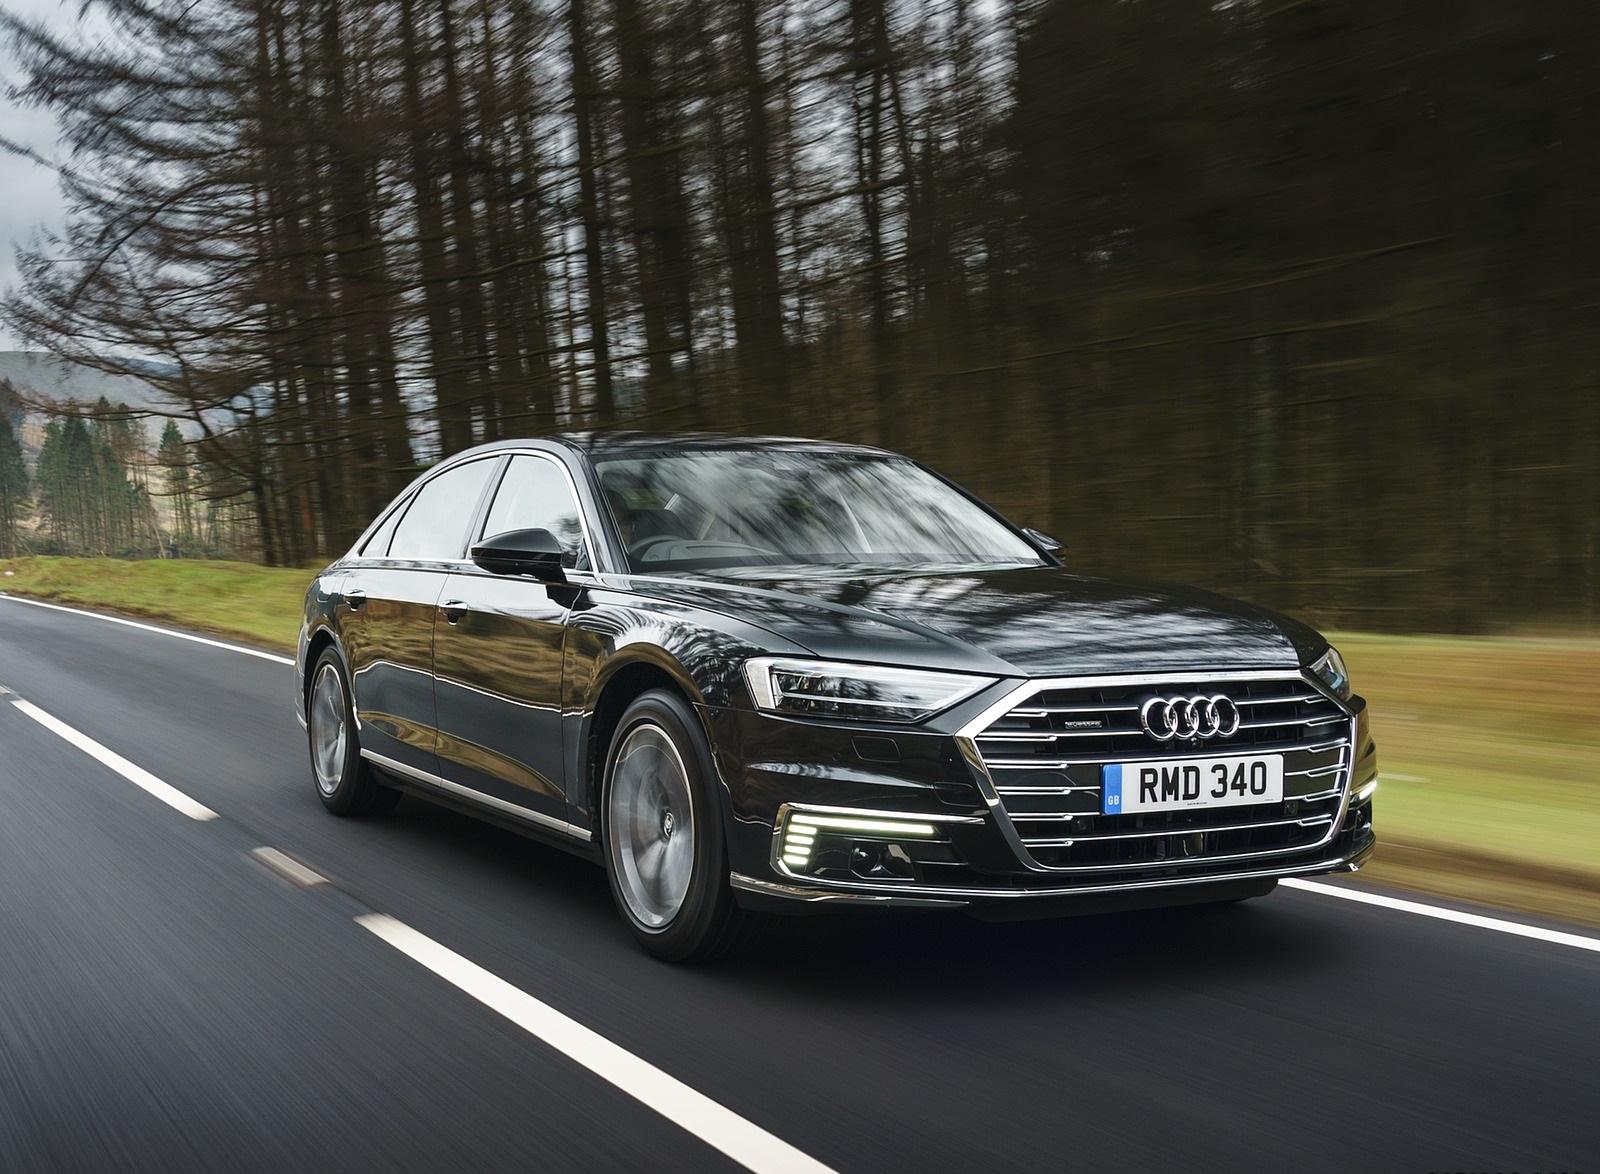 2020 Audi A8 L 60 TFSI e quattro (Plug-In Hybrid UK-Spec) Front Three-Quarter Wallpapers (2)